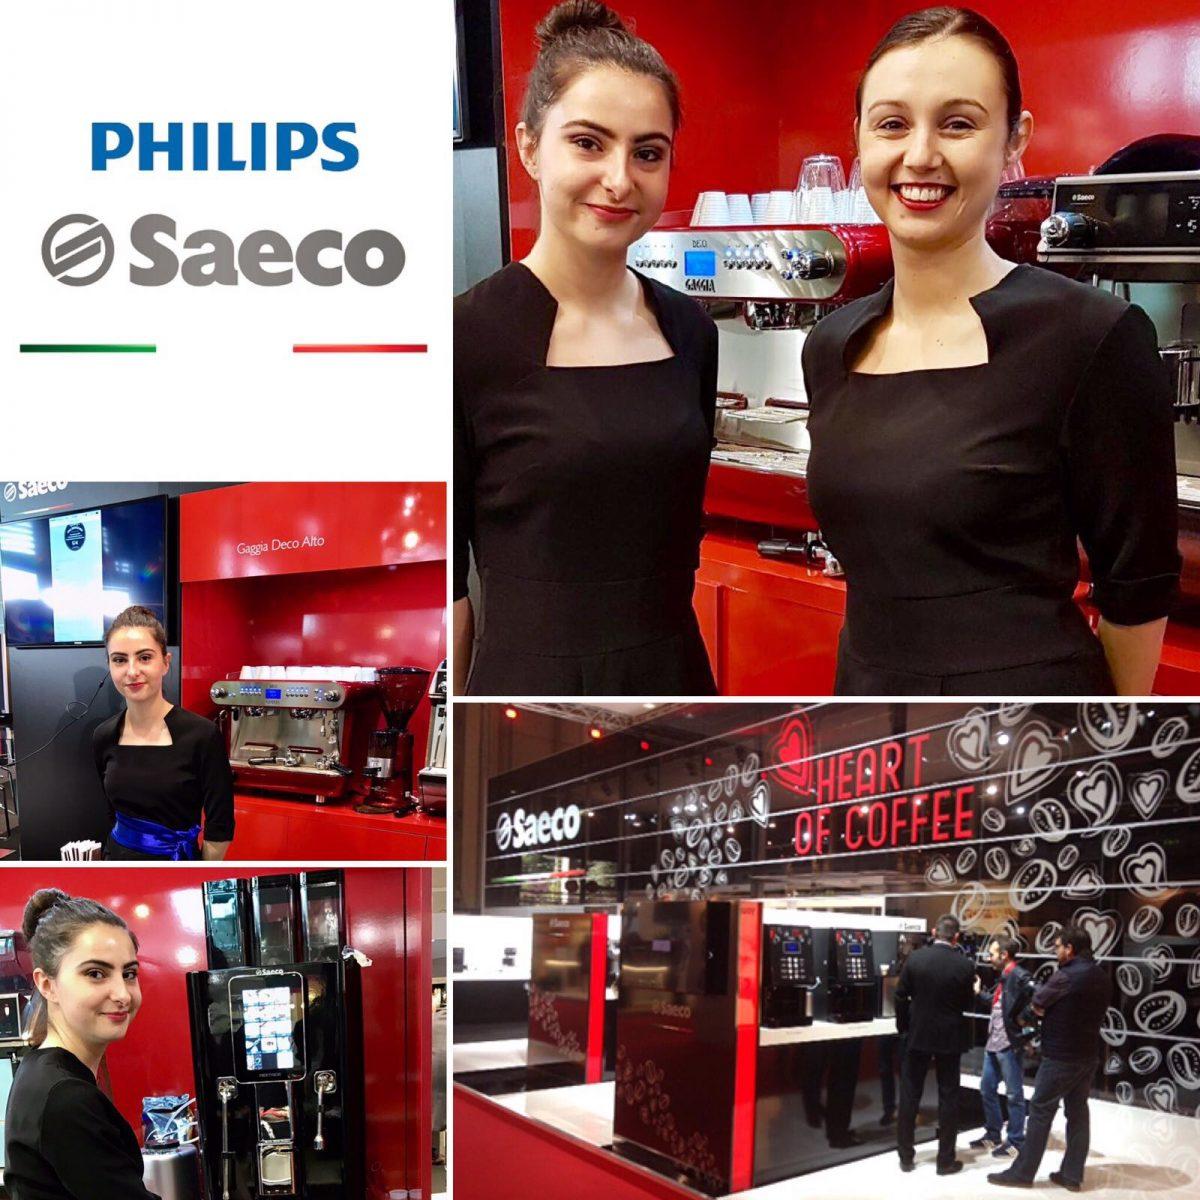 Agence d'hotesses Agence Elegance hotesses au salon Vending Paris pour SAECO Philips